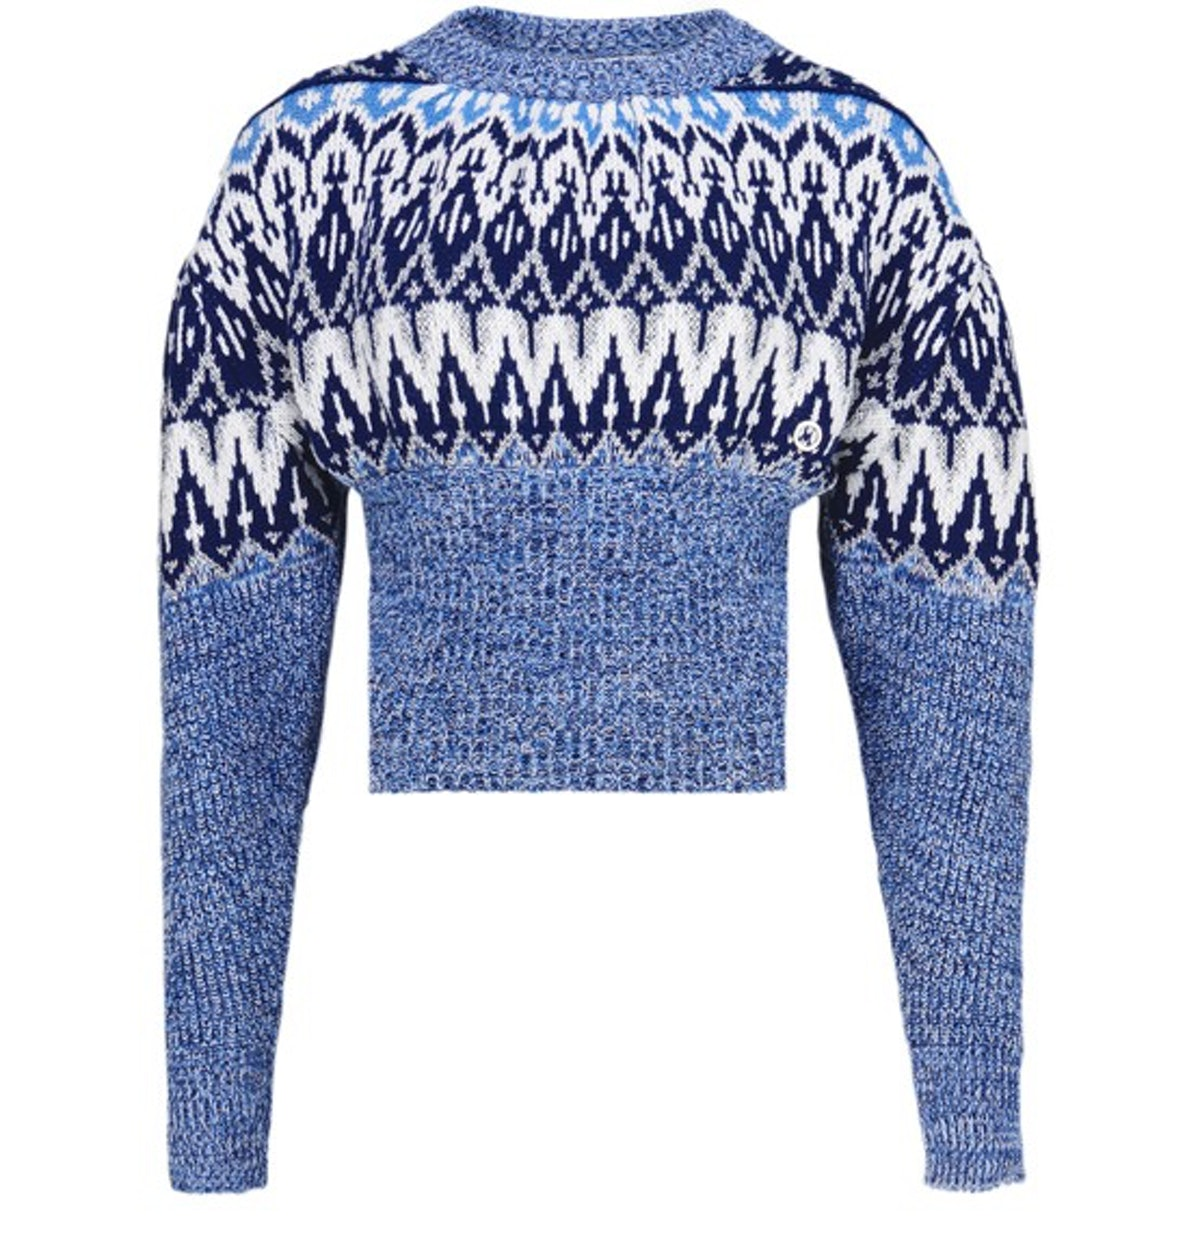 Sweater: image 1